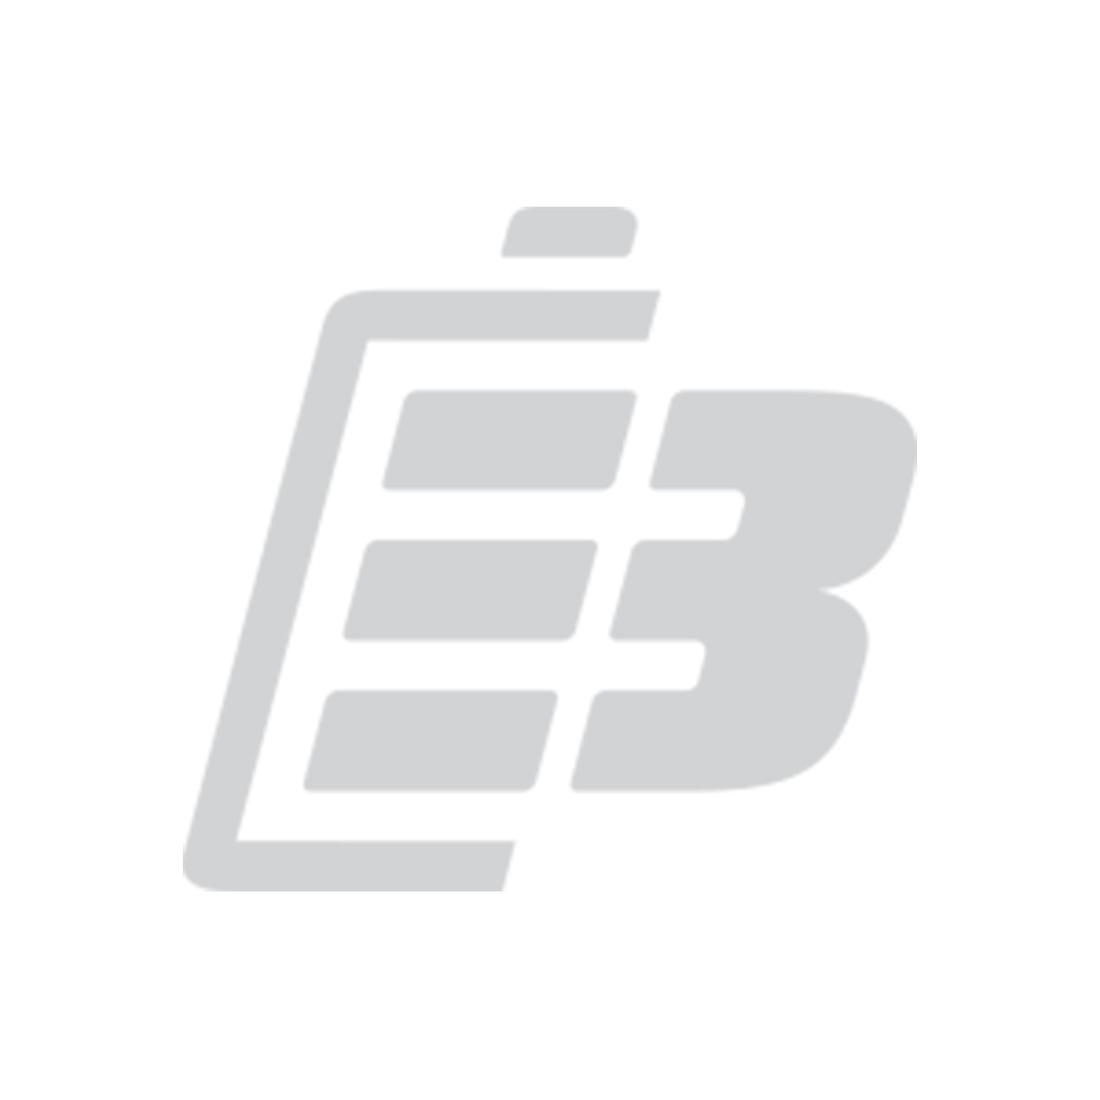 Laptop battery Asus N550_1